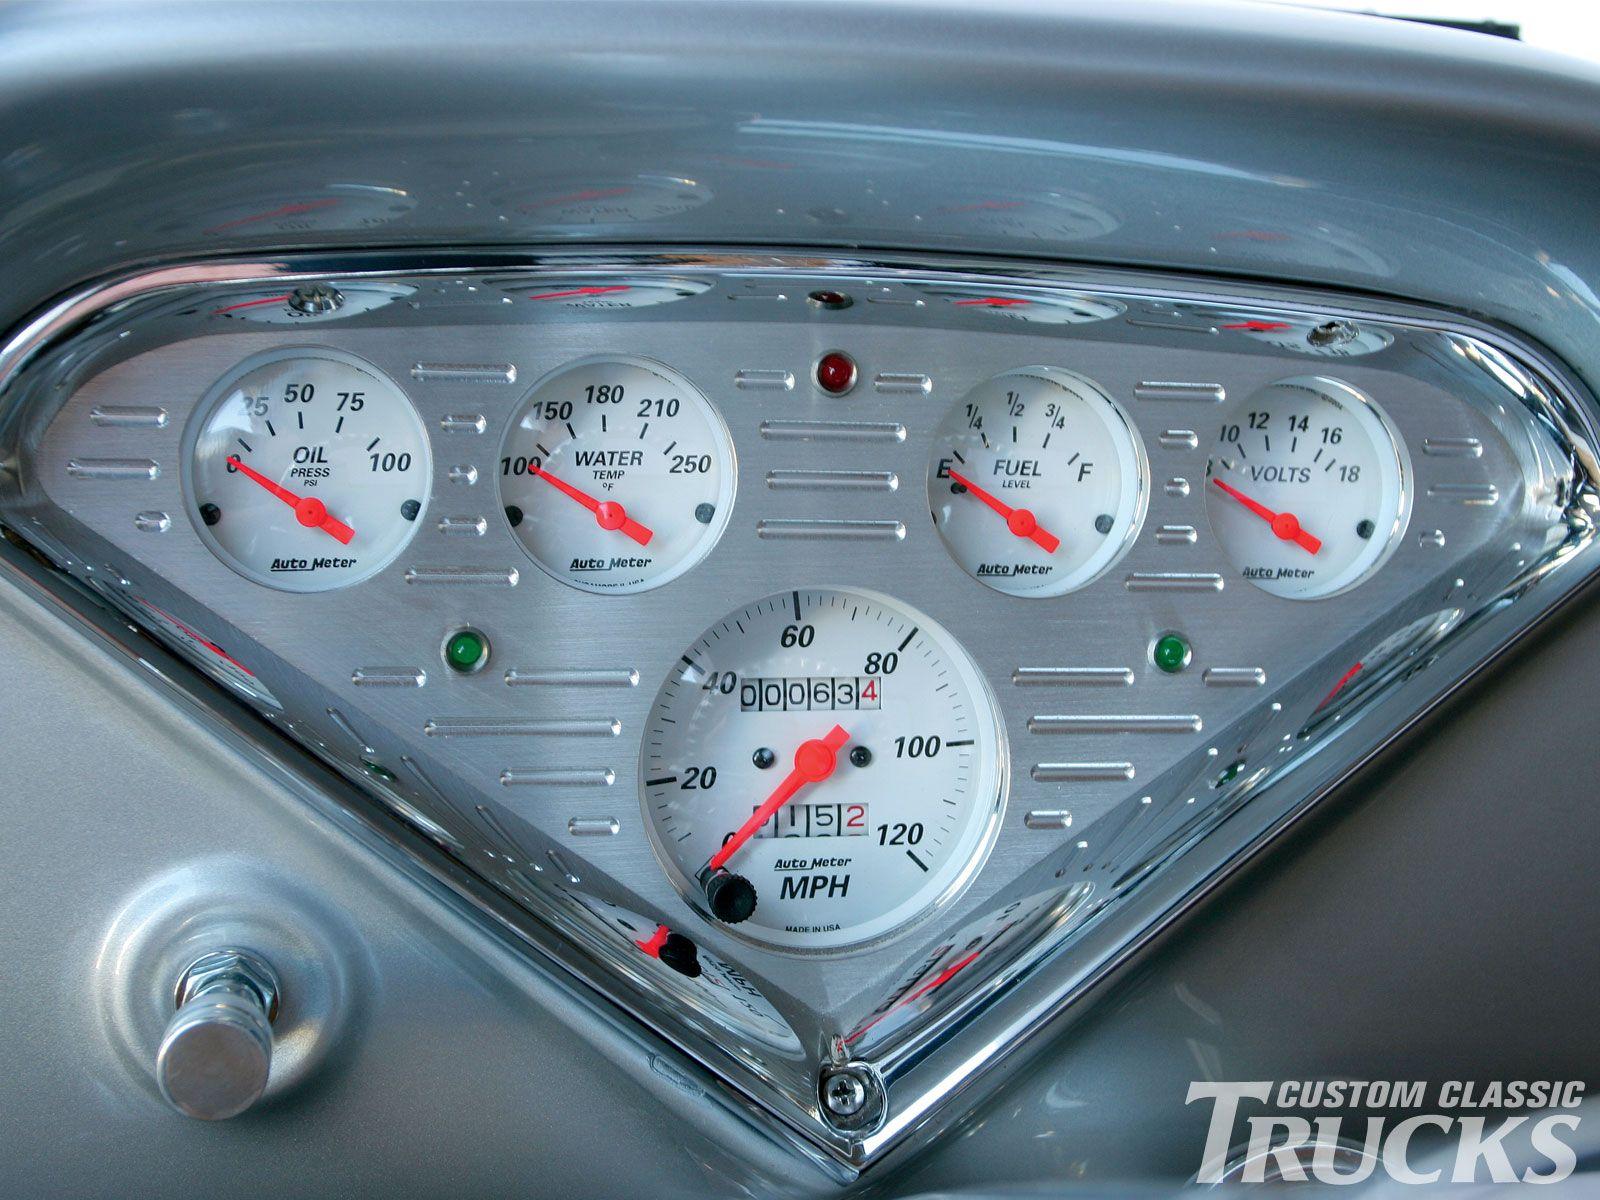 Custom dashboards 1958 chevy apache pickup truck custom dash gauges